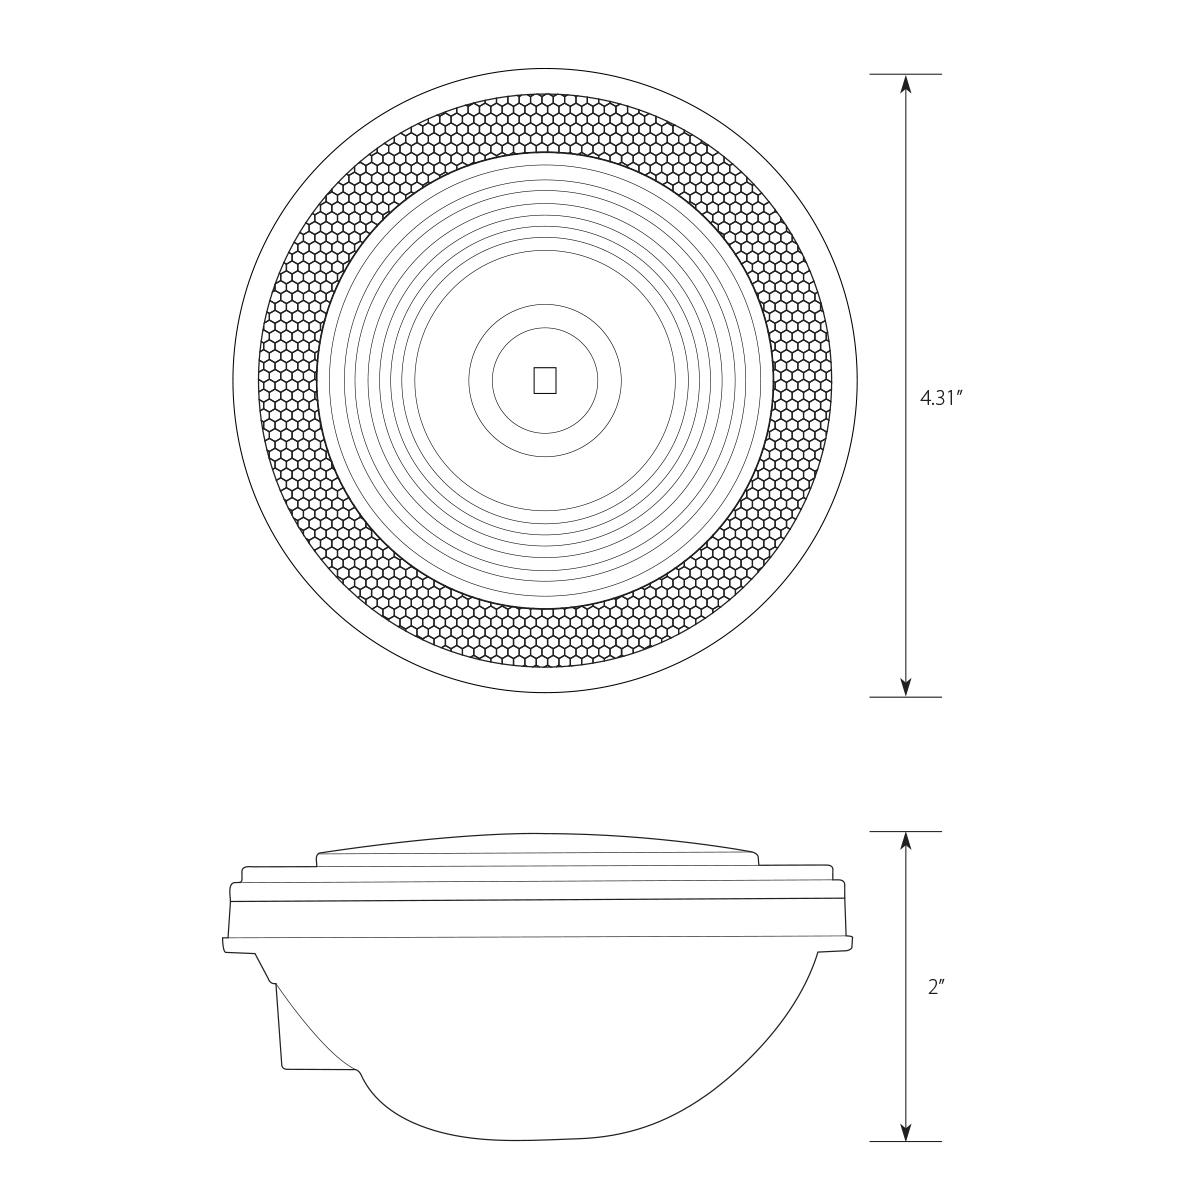 "4"" Single LED w/Reflective Ring Lens"